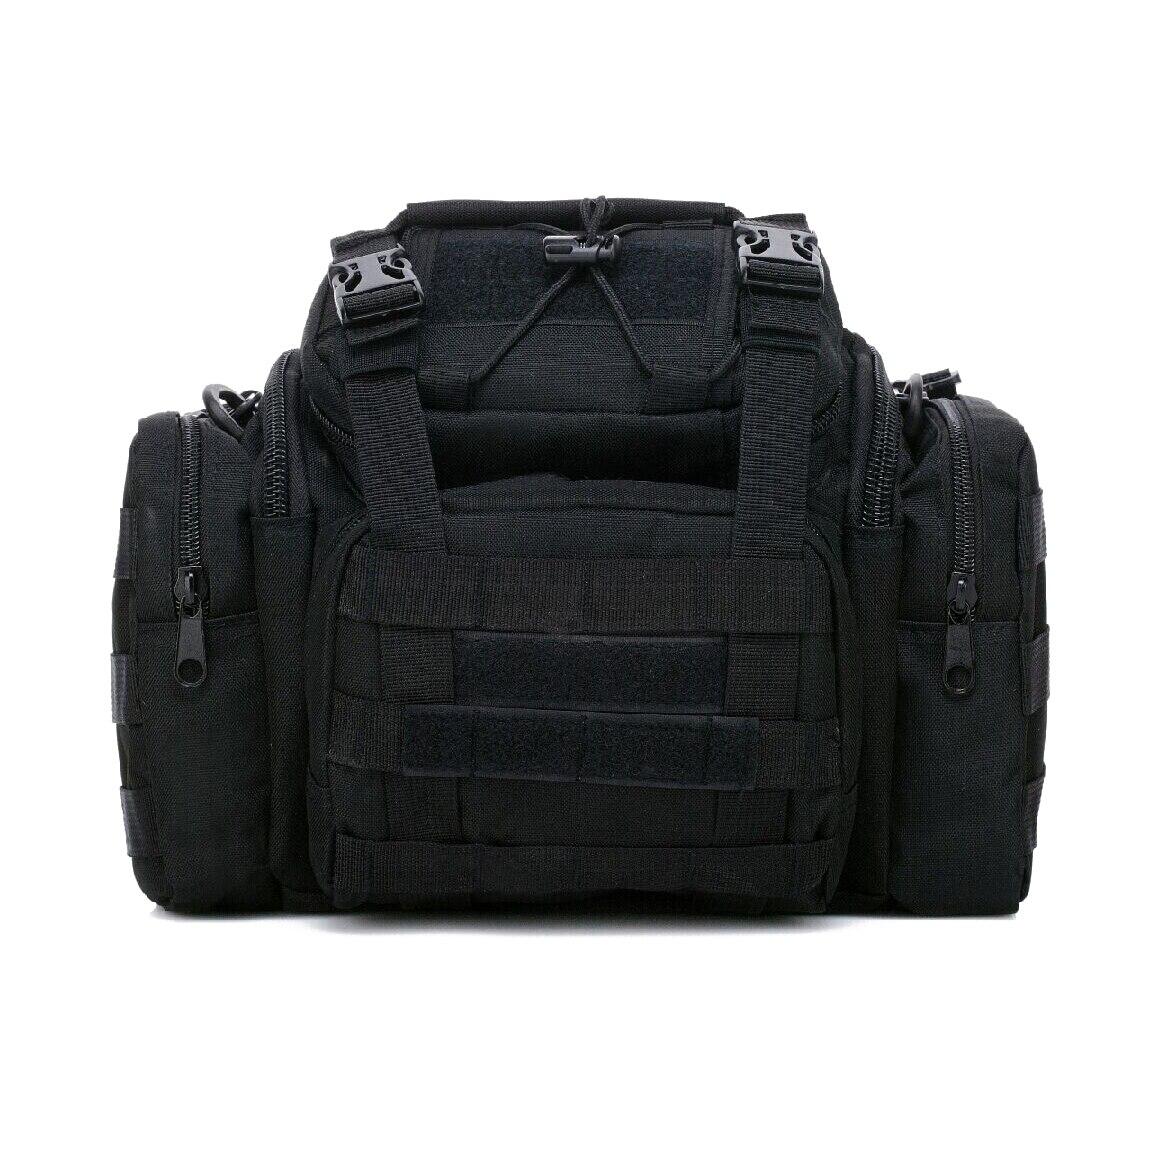 Sea/<font><b>Carp</b></font>/Fly Fishing Tackle Bag Waterproof Storage Waist Shoulder Carry Case Black